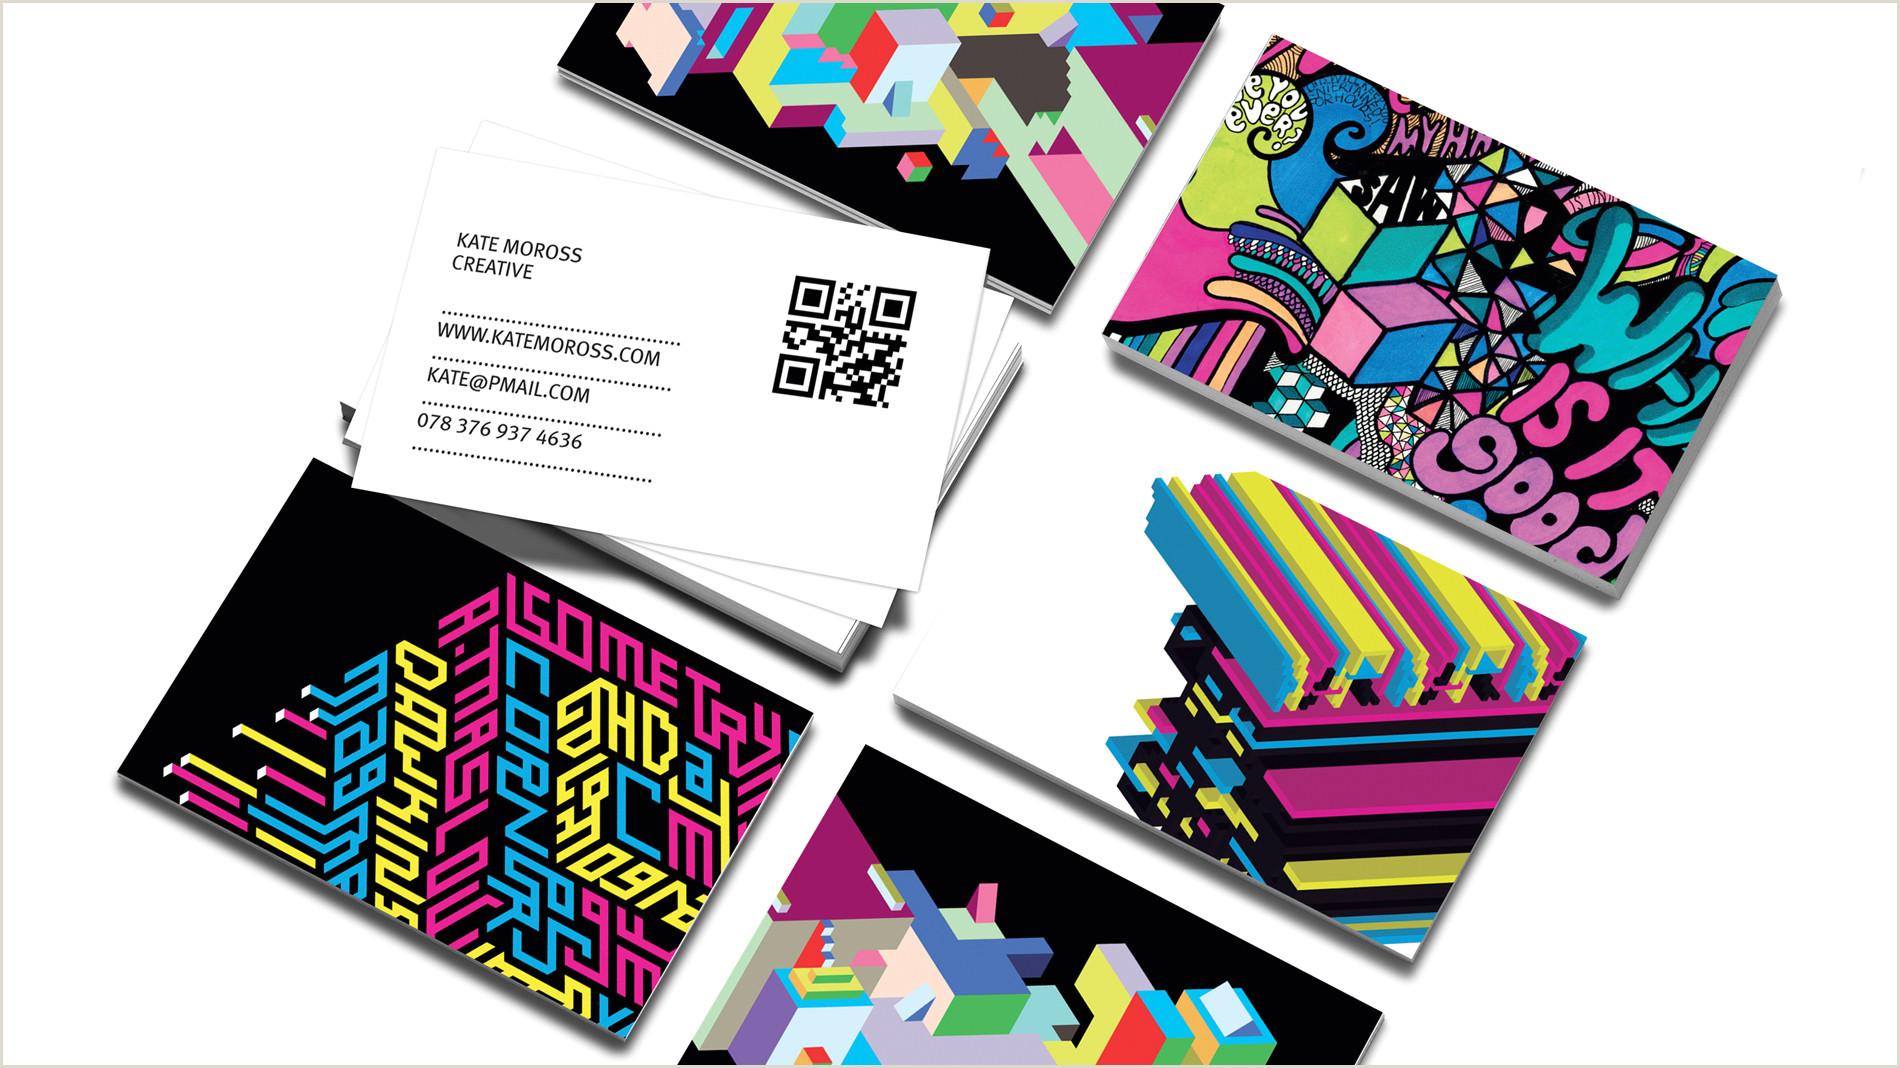 Unique Ideas For Business Cards 30 Unconventional Business Cards